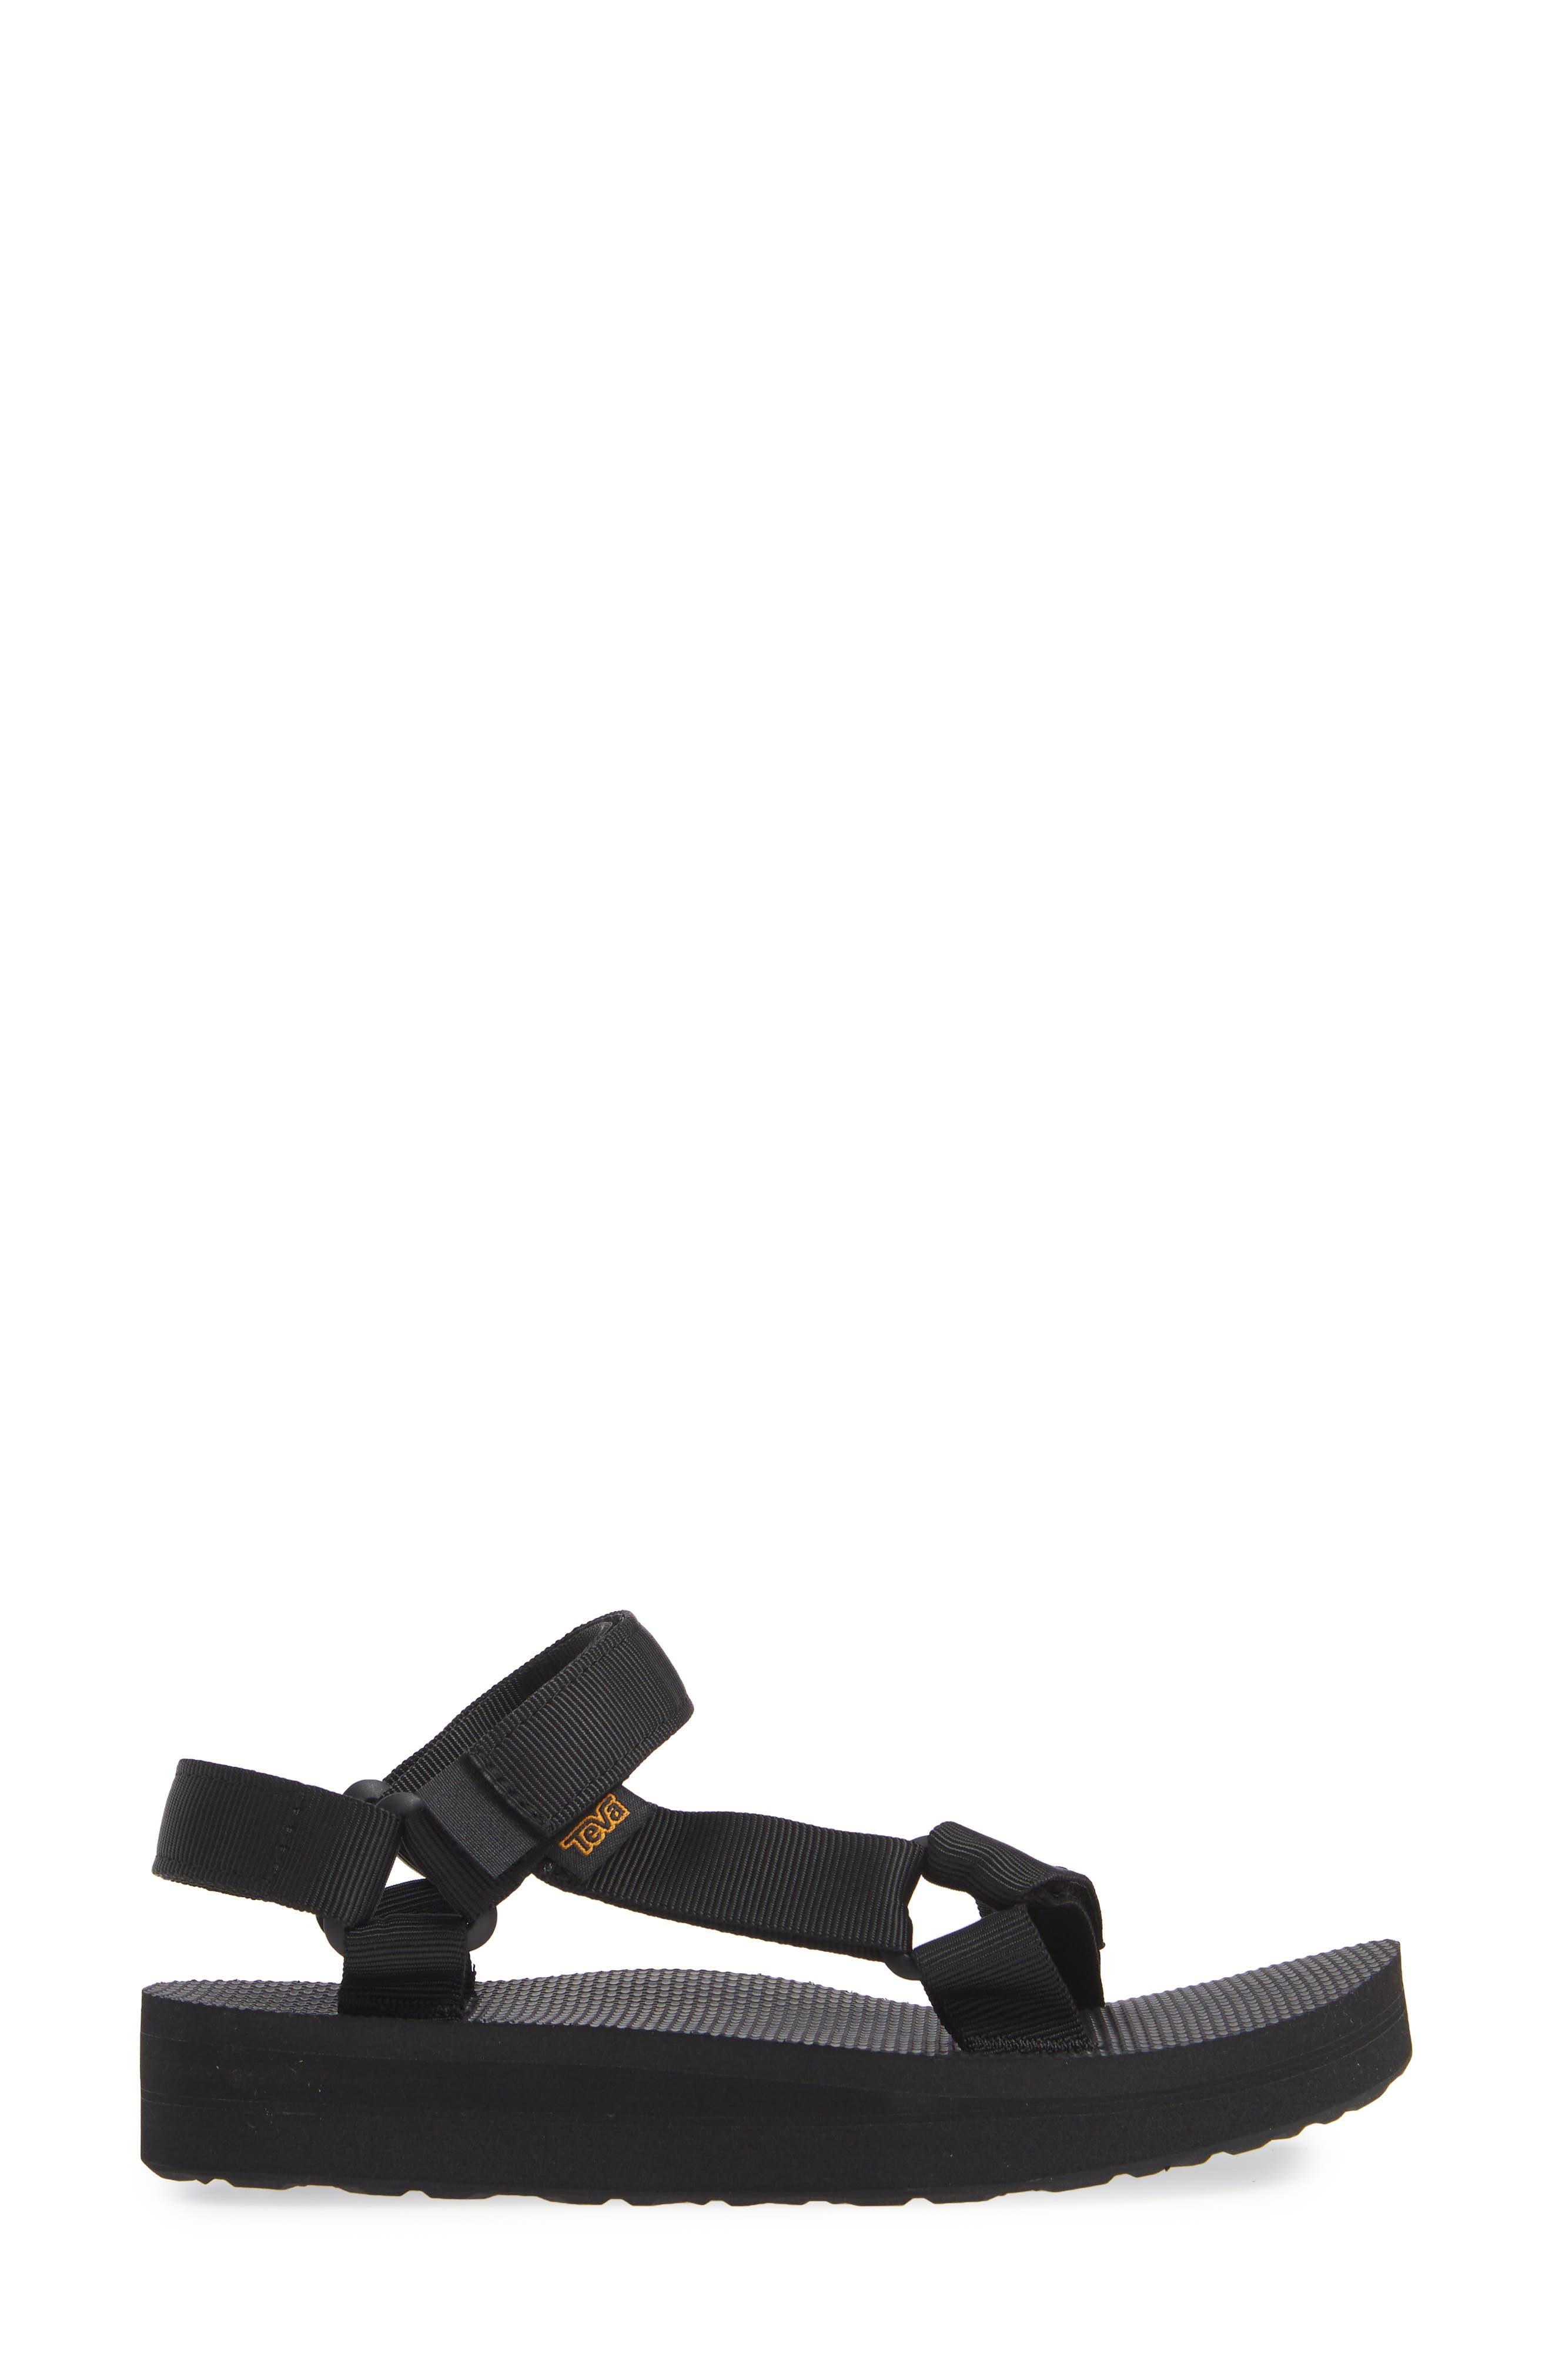 Midform Universal Geometric Sandal,                             Alternate thumbnail 3, color,                             BLACK FABRIC